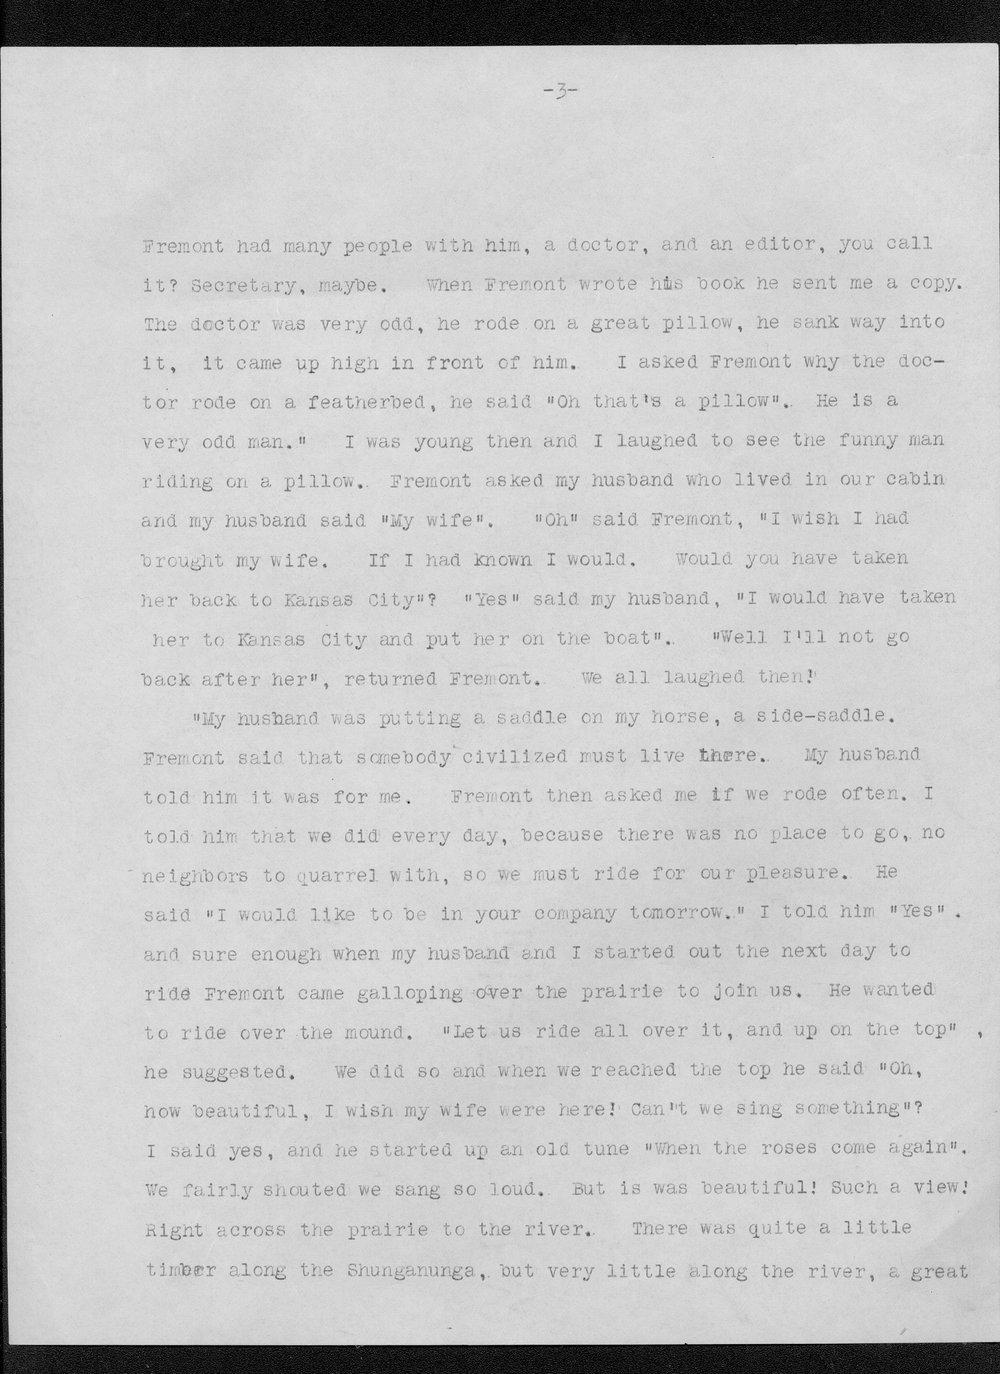 Julia Ann Stinson correspondence - 3